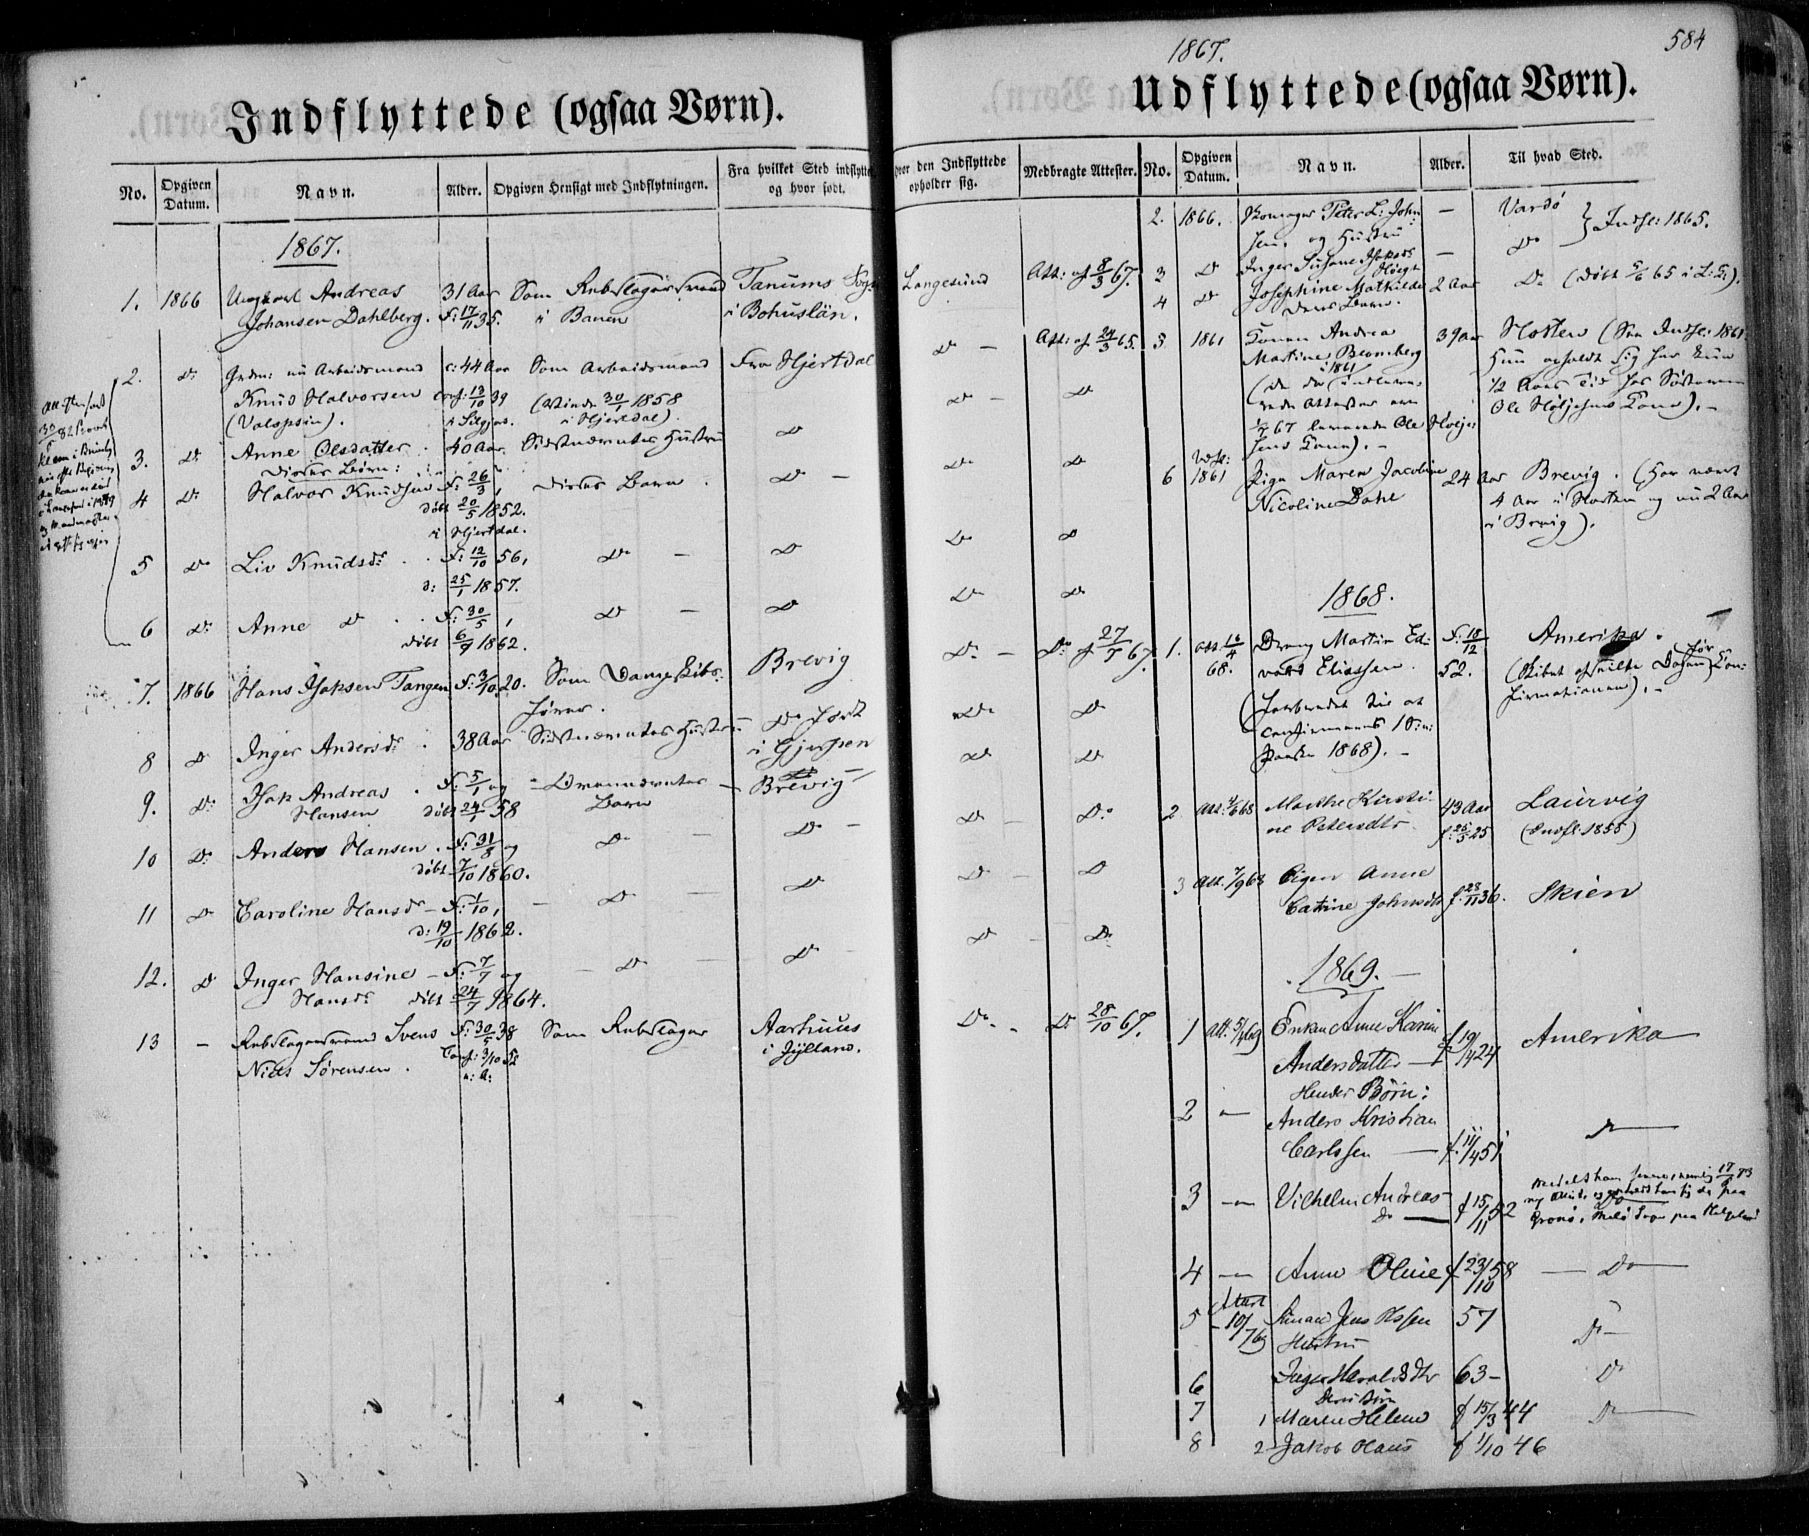 SAKO, Bamble kirkebøker, F/Fa/L0005: Ministerialbok nr. I 5, 1854-1869, s. 584